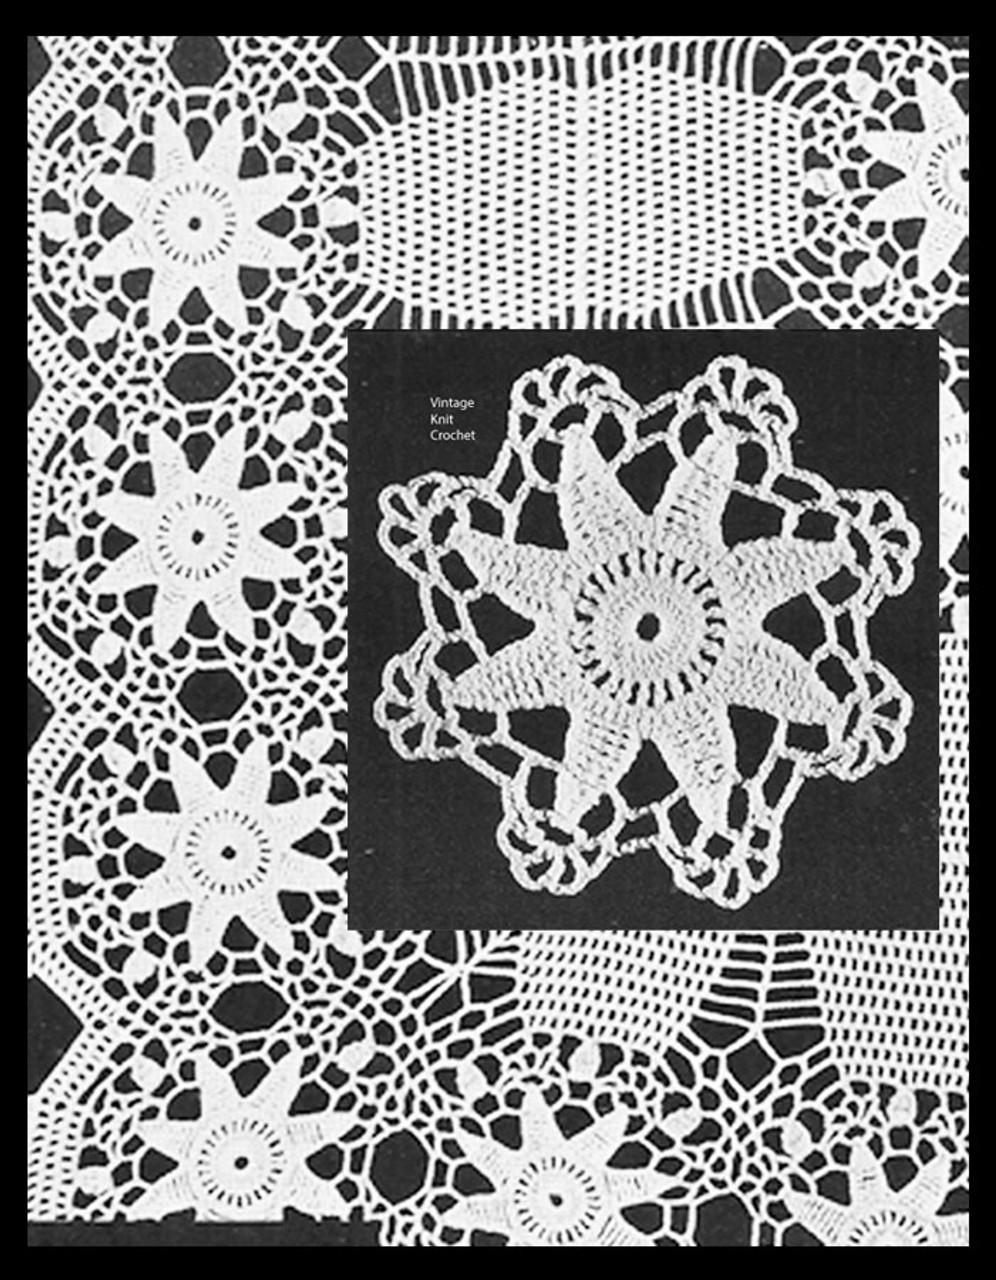 Vintage Crochet Bedspread Pattern, Star Medallion